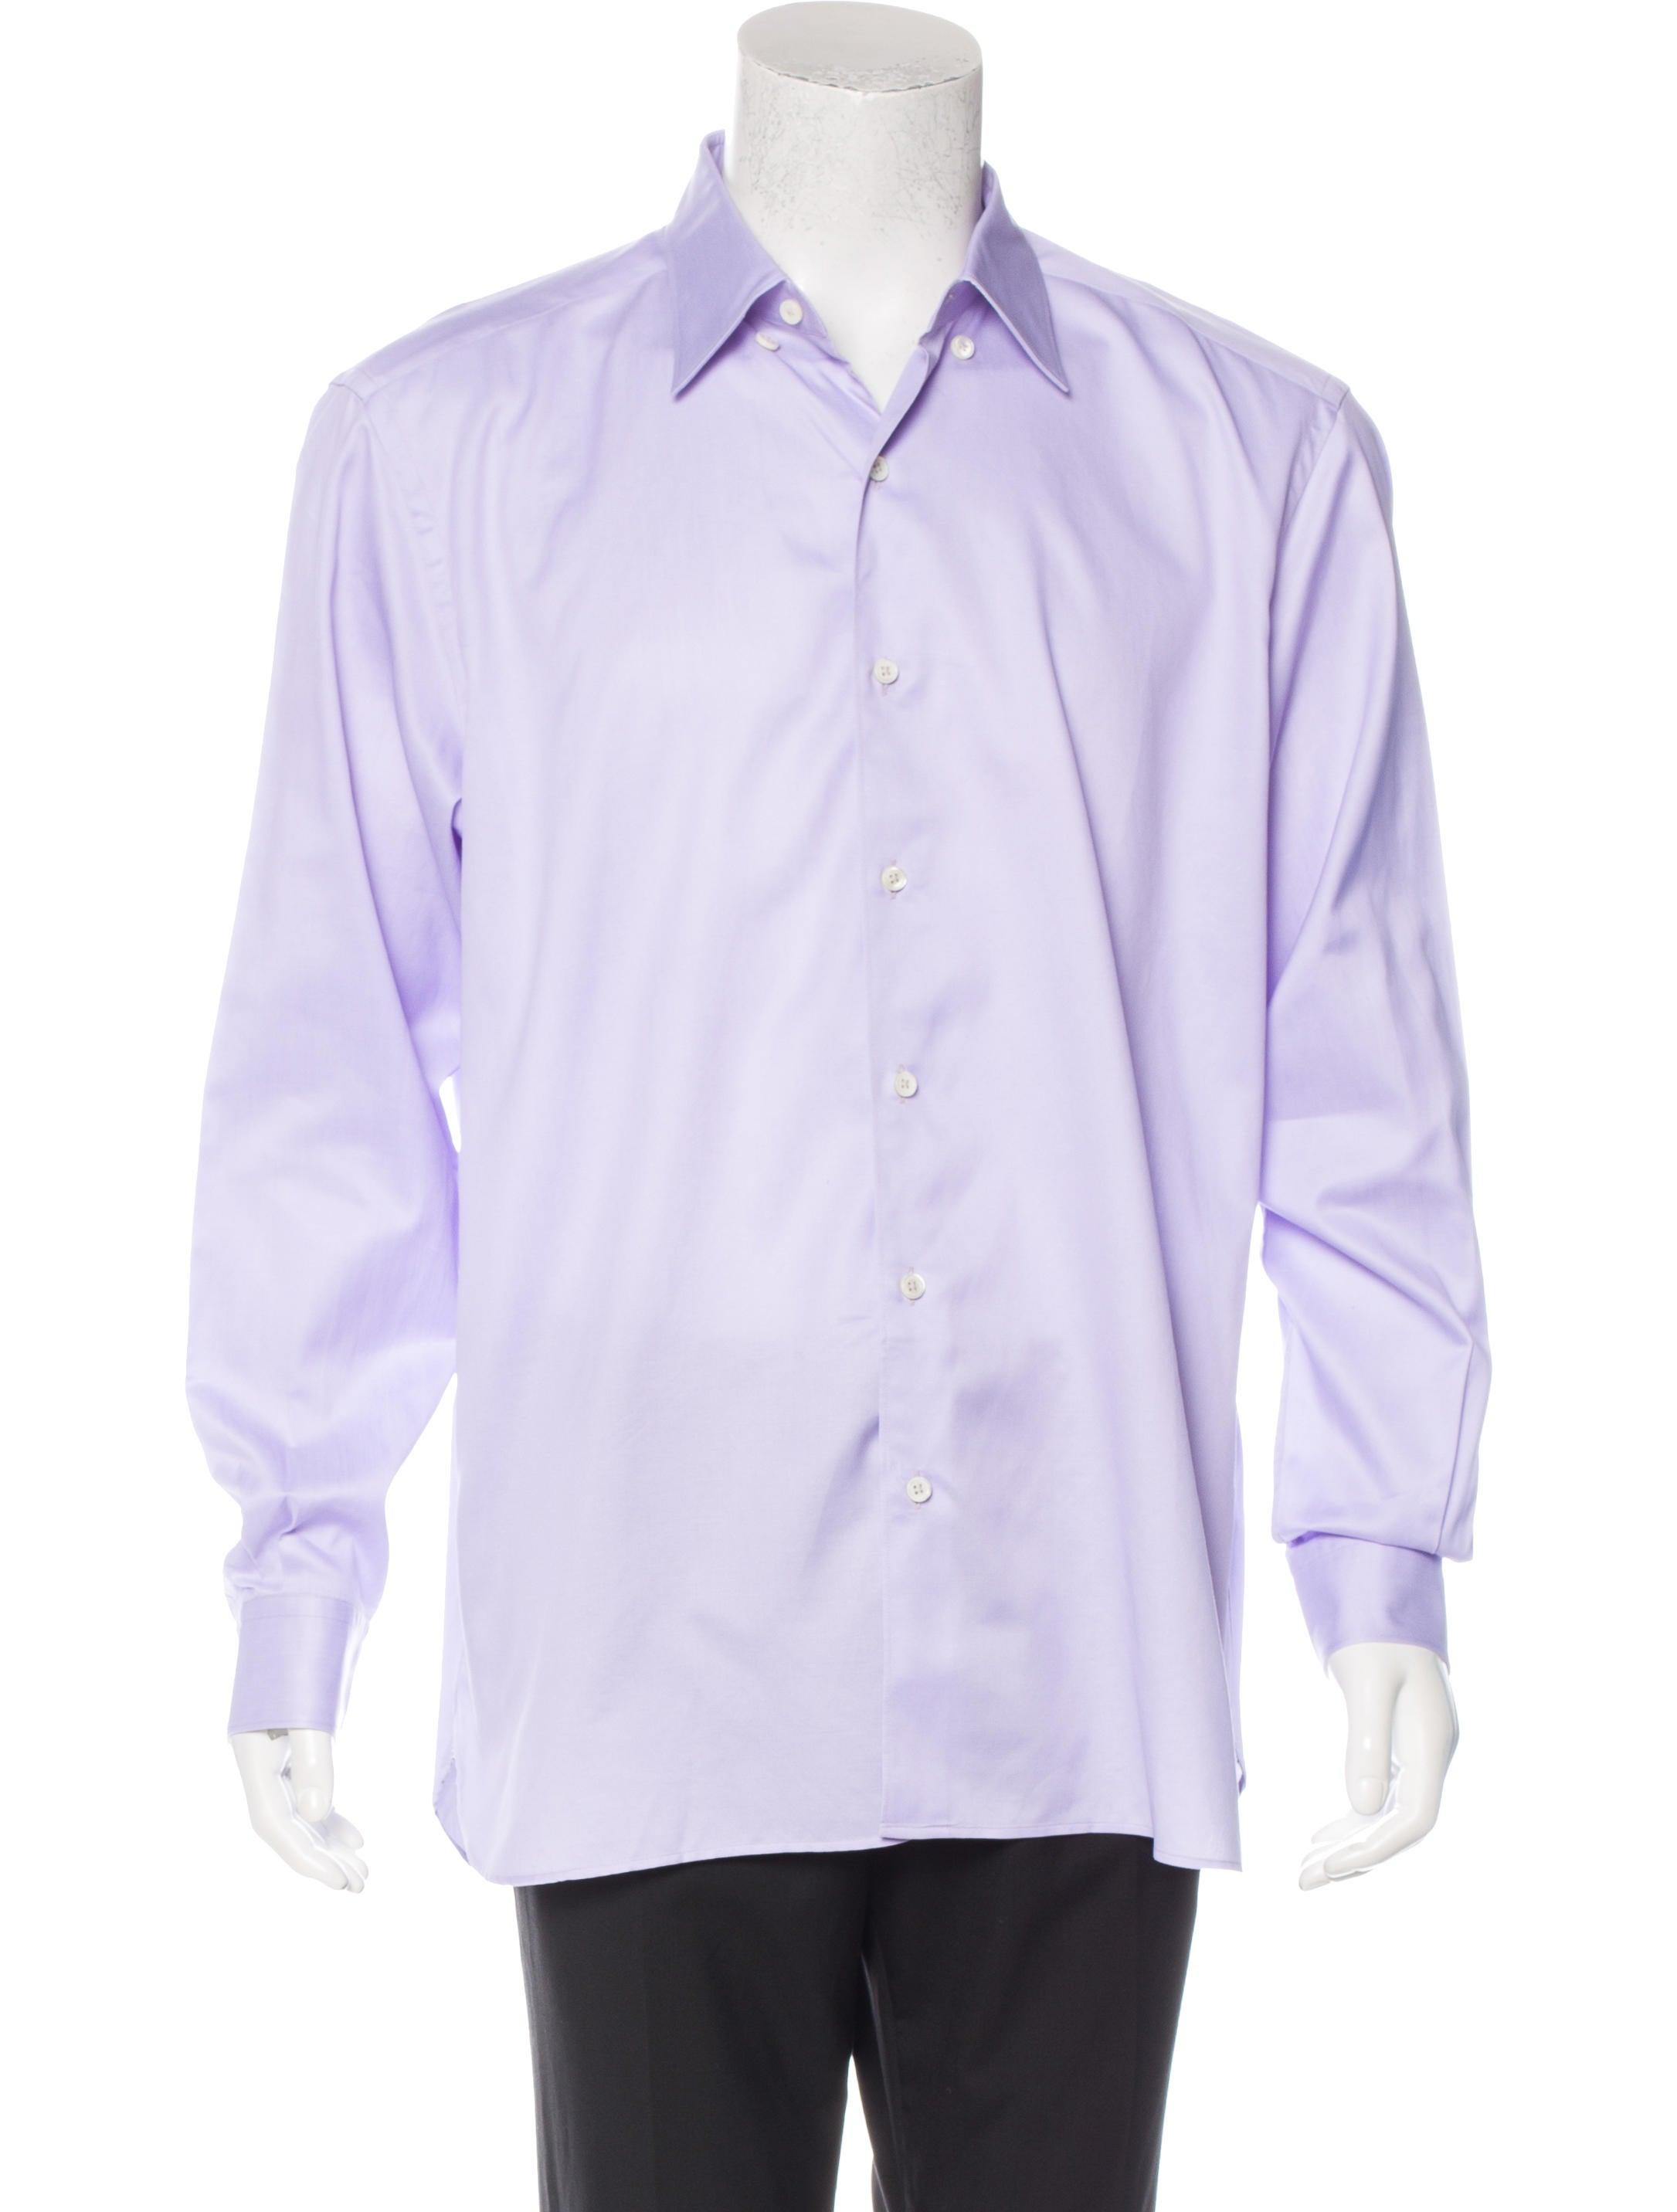 ermenegildo zegna woven button up shirt clothing zgn24619 the realreal. Black Bedroom Furniture Sets. Home Design Ideas